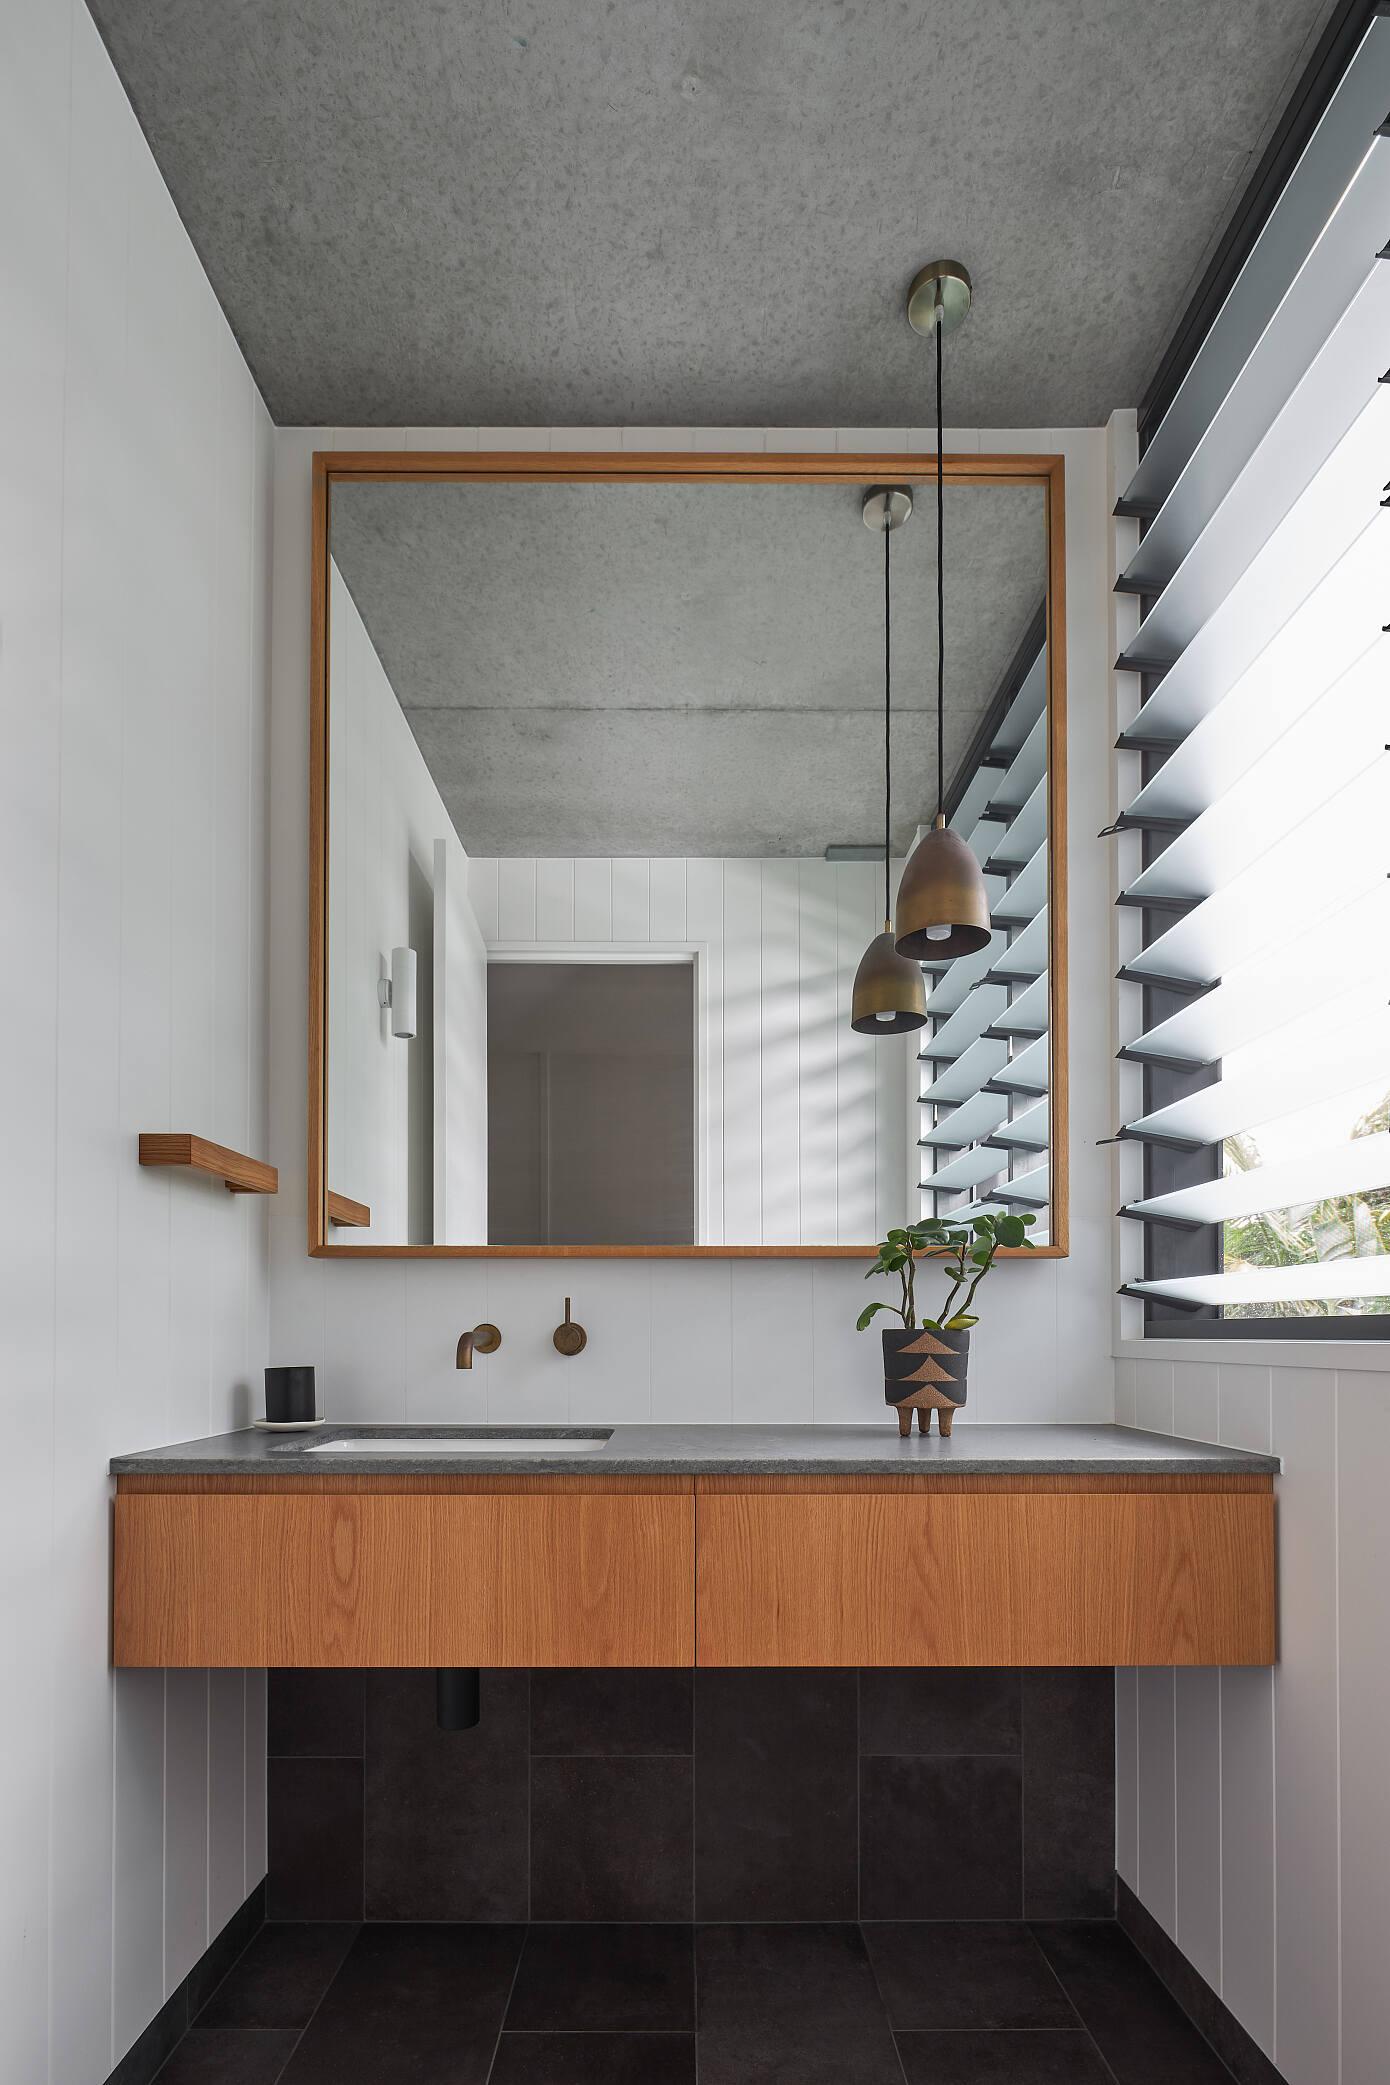 Larus Marinus by Harley Graham Architects